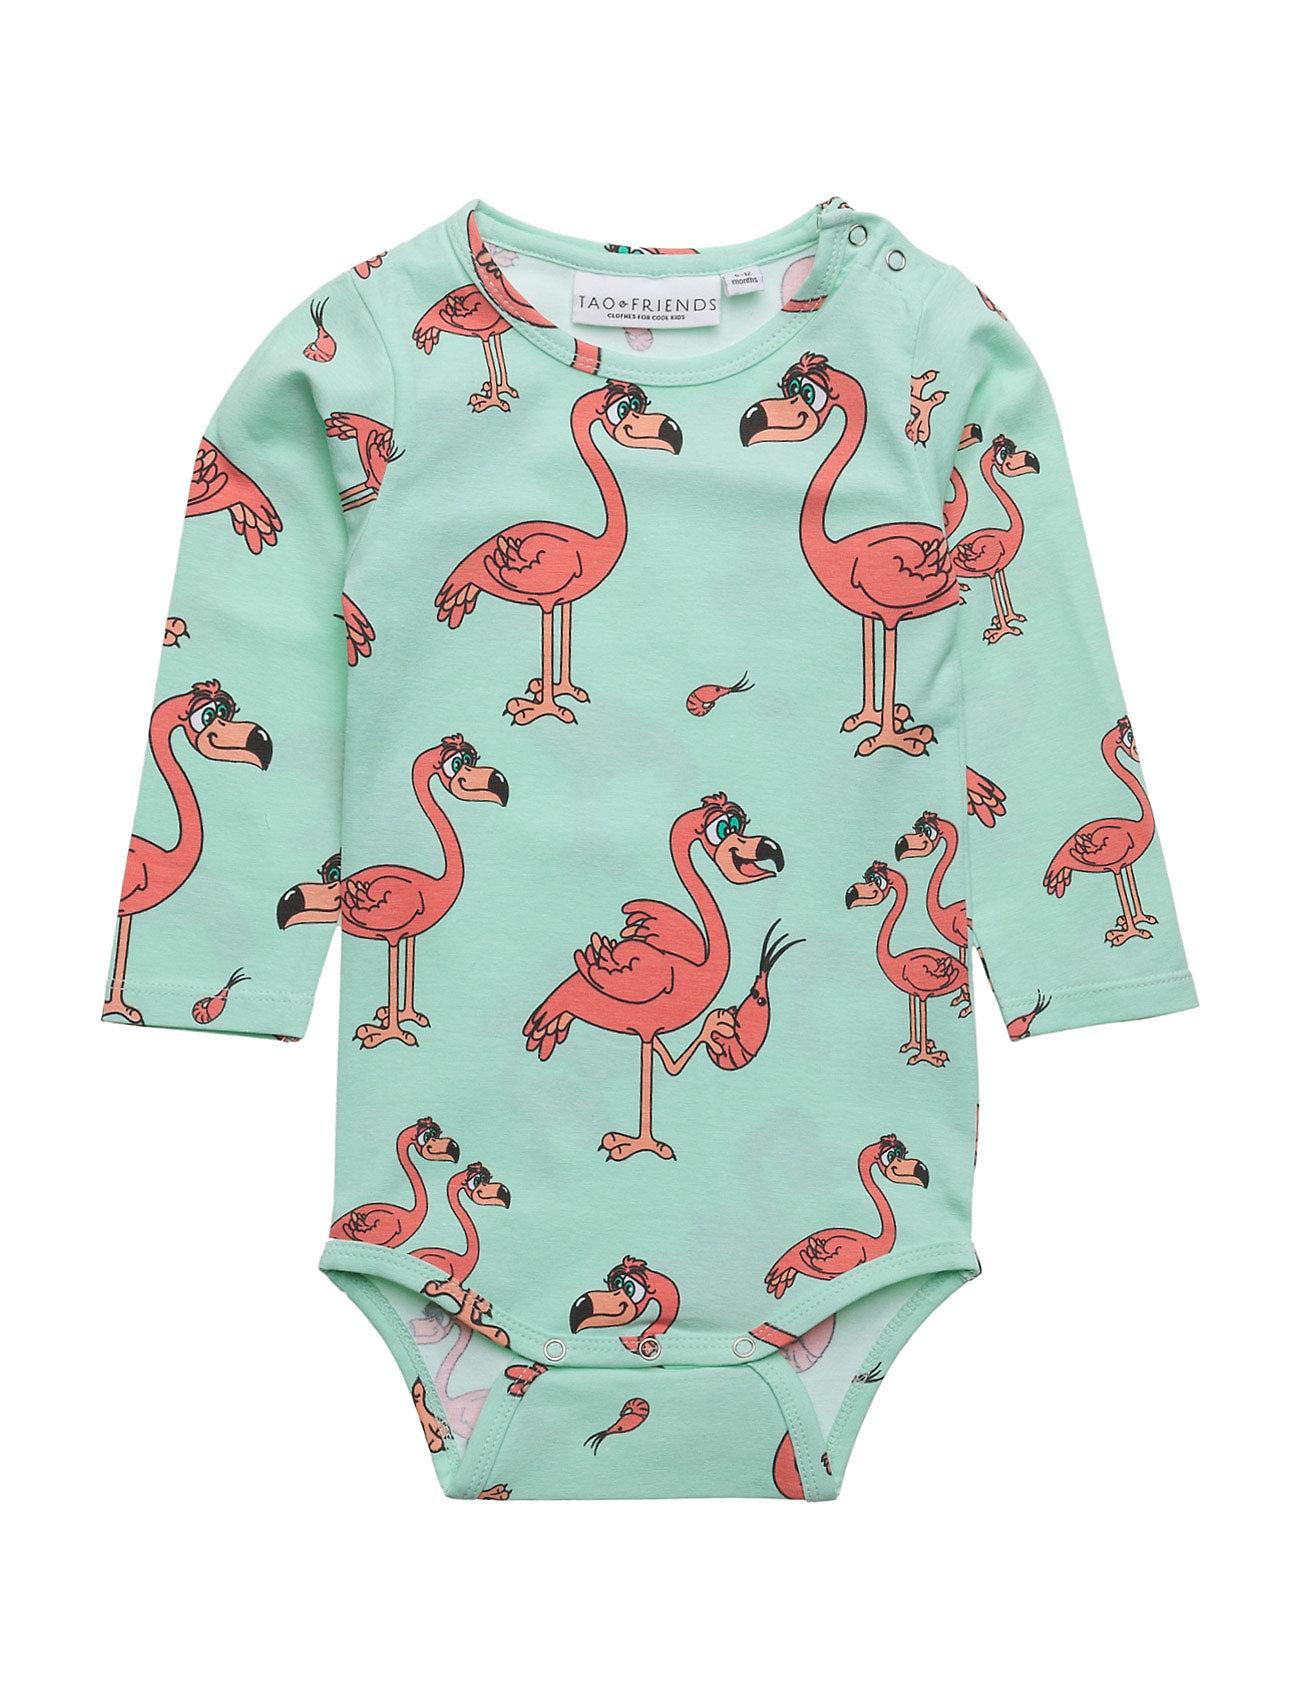 Baby Body Flamingon Multi-Animal Mint Tao & friends Langærmede bodies til Børn i Mint Green